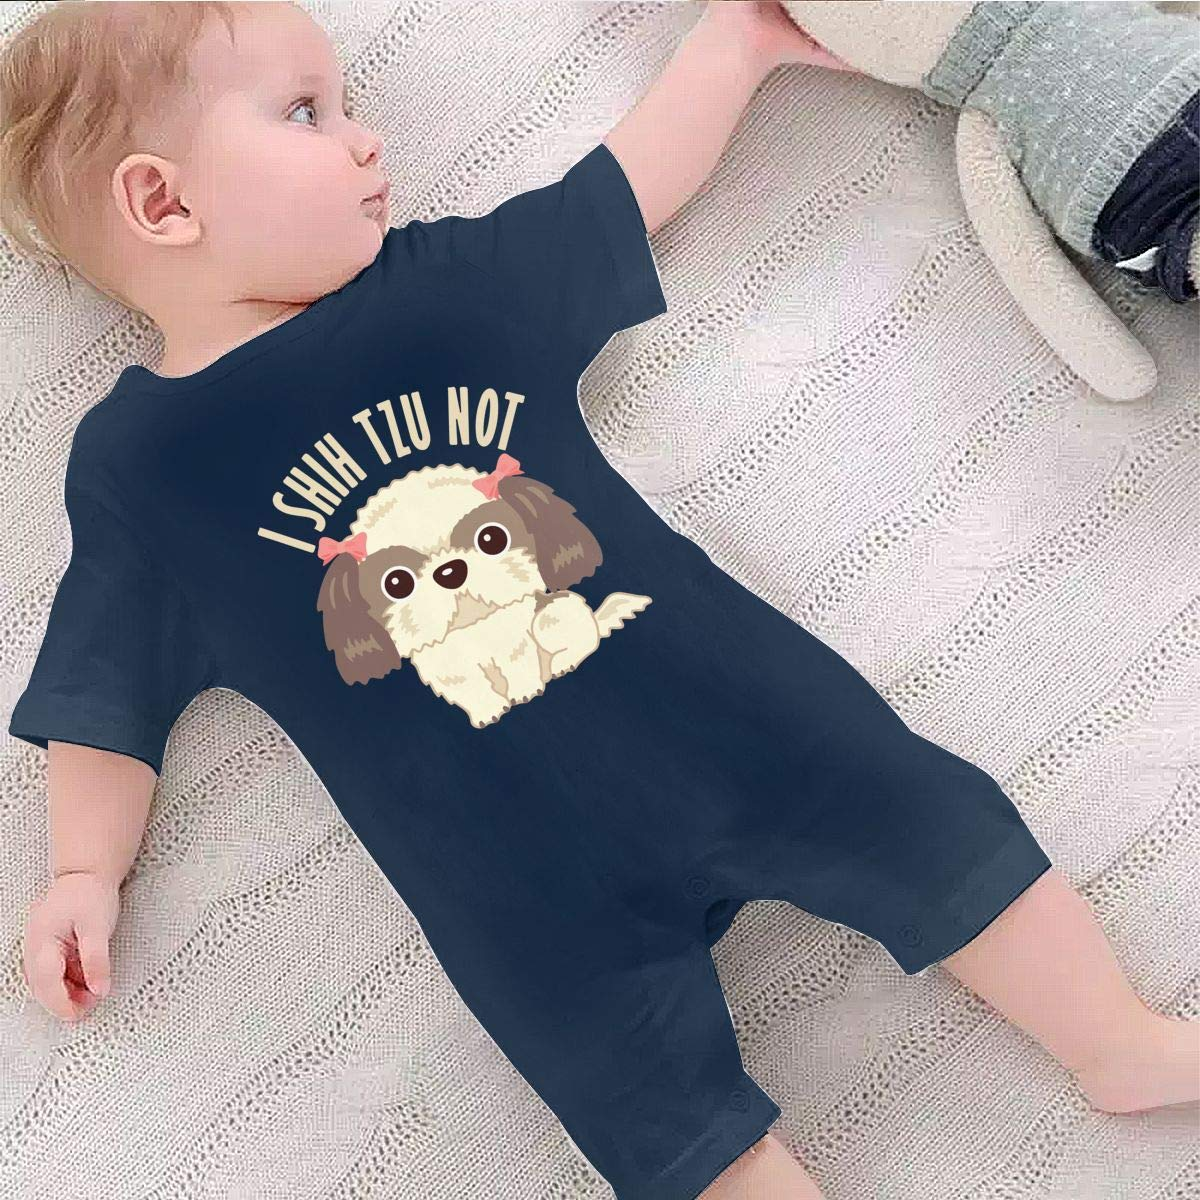 A1BY-5US Newborn Infant Baby Girls Boys Bodysuits Shih Tzu Dog Cotton Short Sleeve Jumpsuit